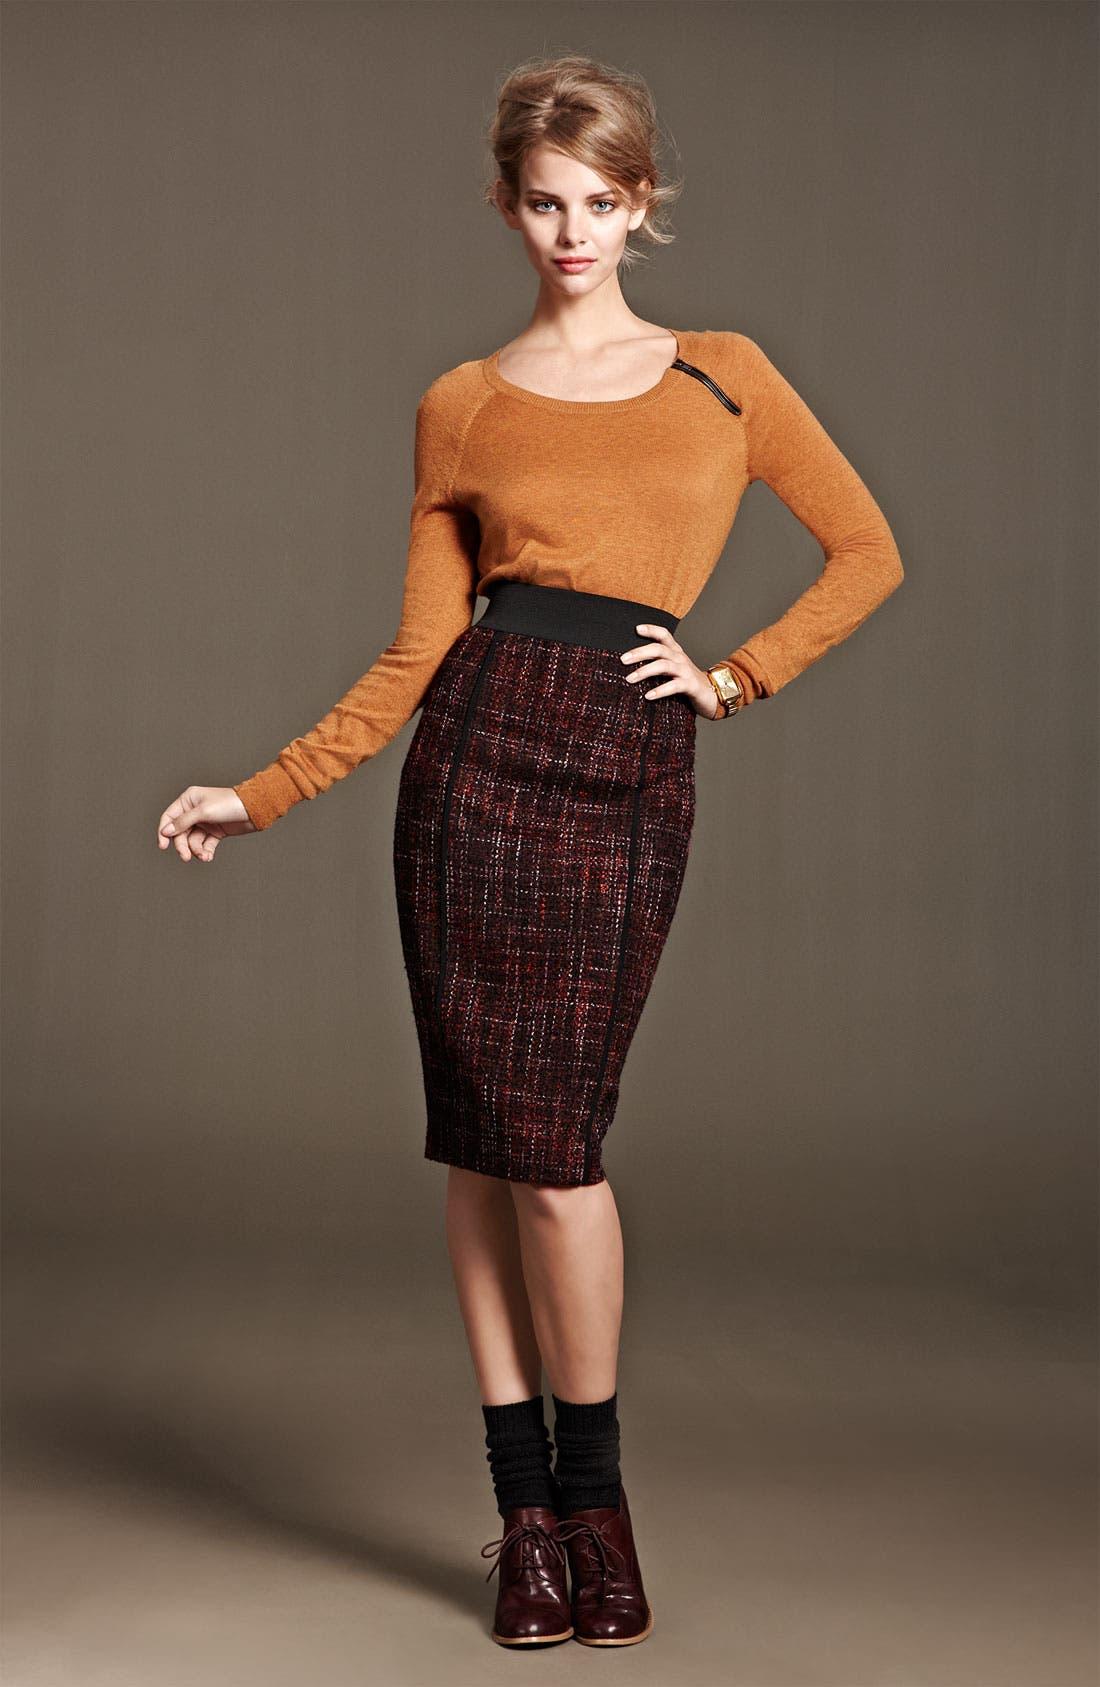 Alternate Image 1 Selected - Halogen® Skirt & Sweater